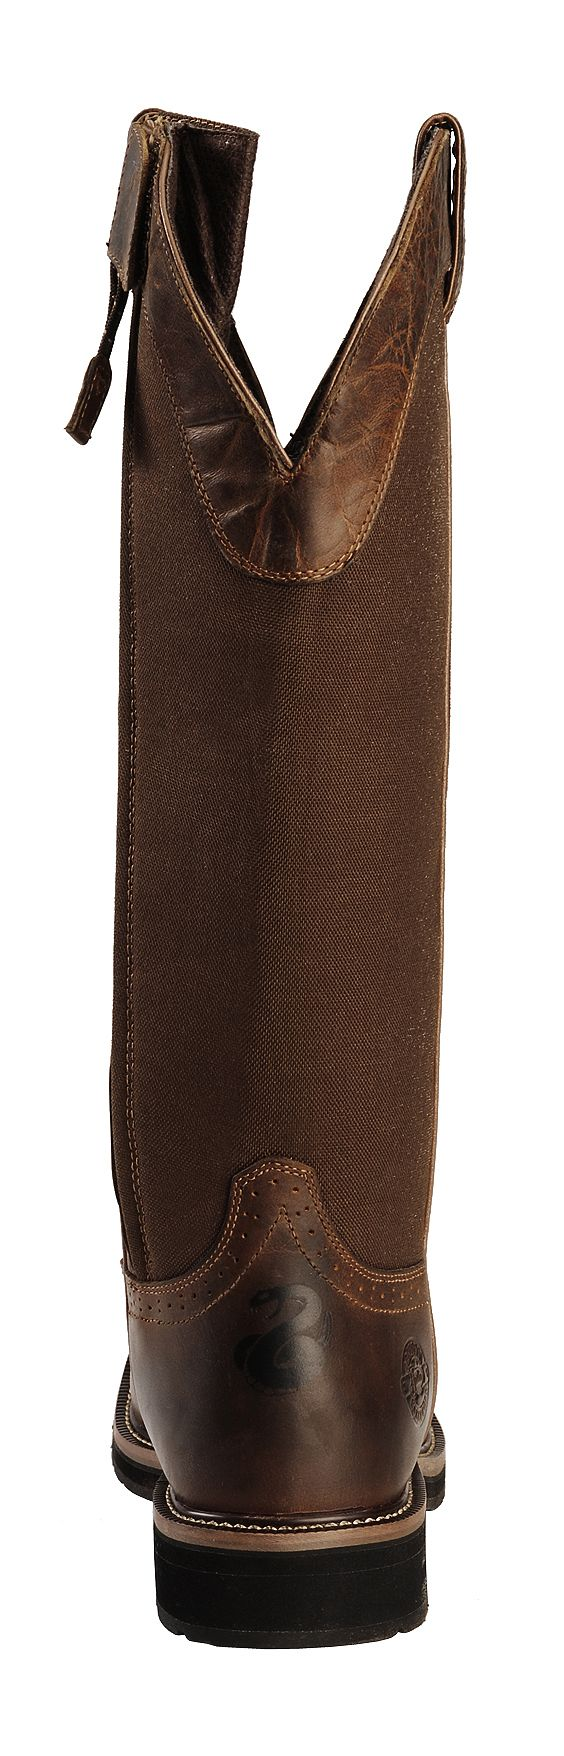 Justin Men S 17 Quot Fielder Brown Snake Proof Boots Soft